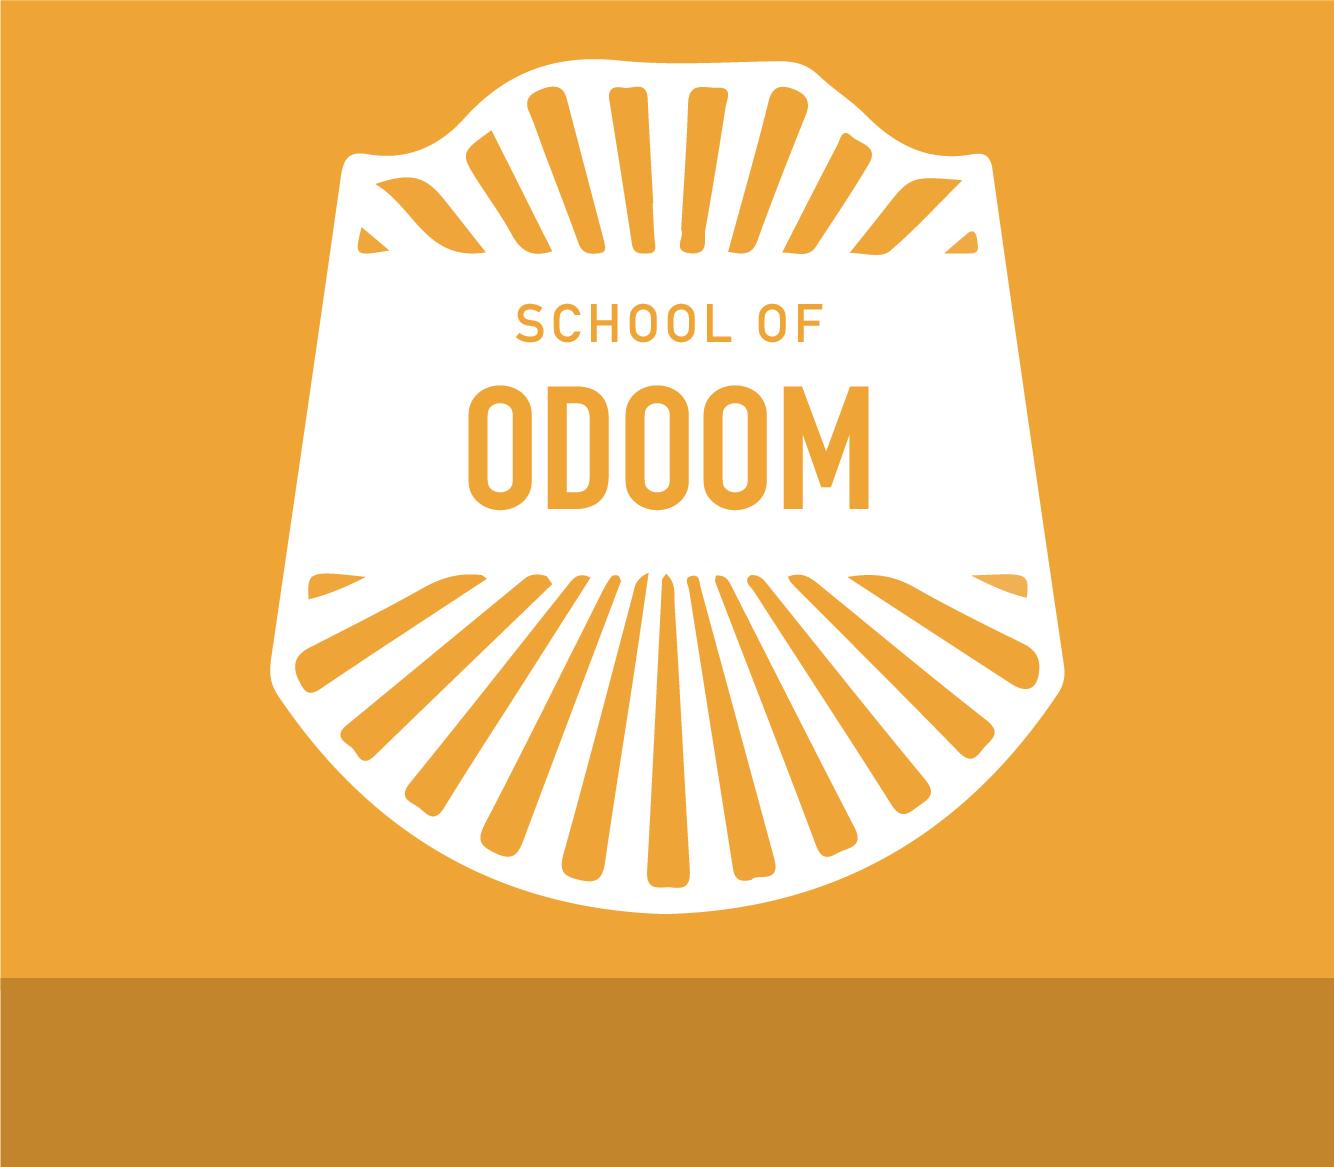 School of odoom